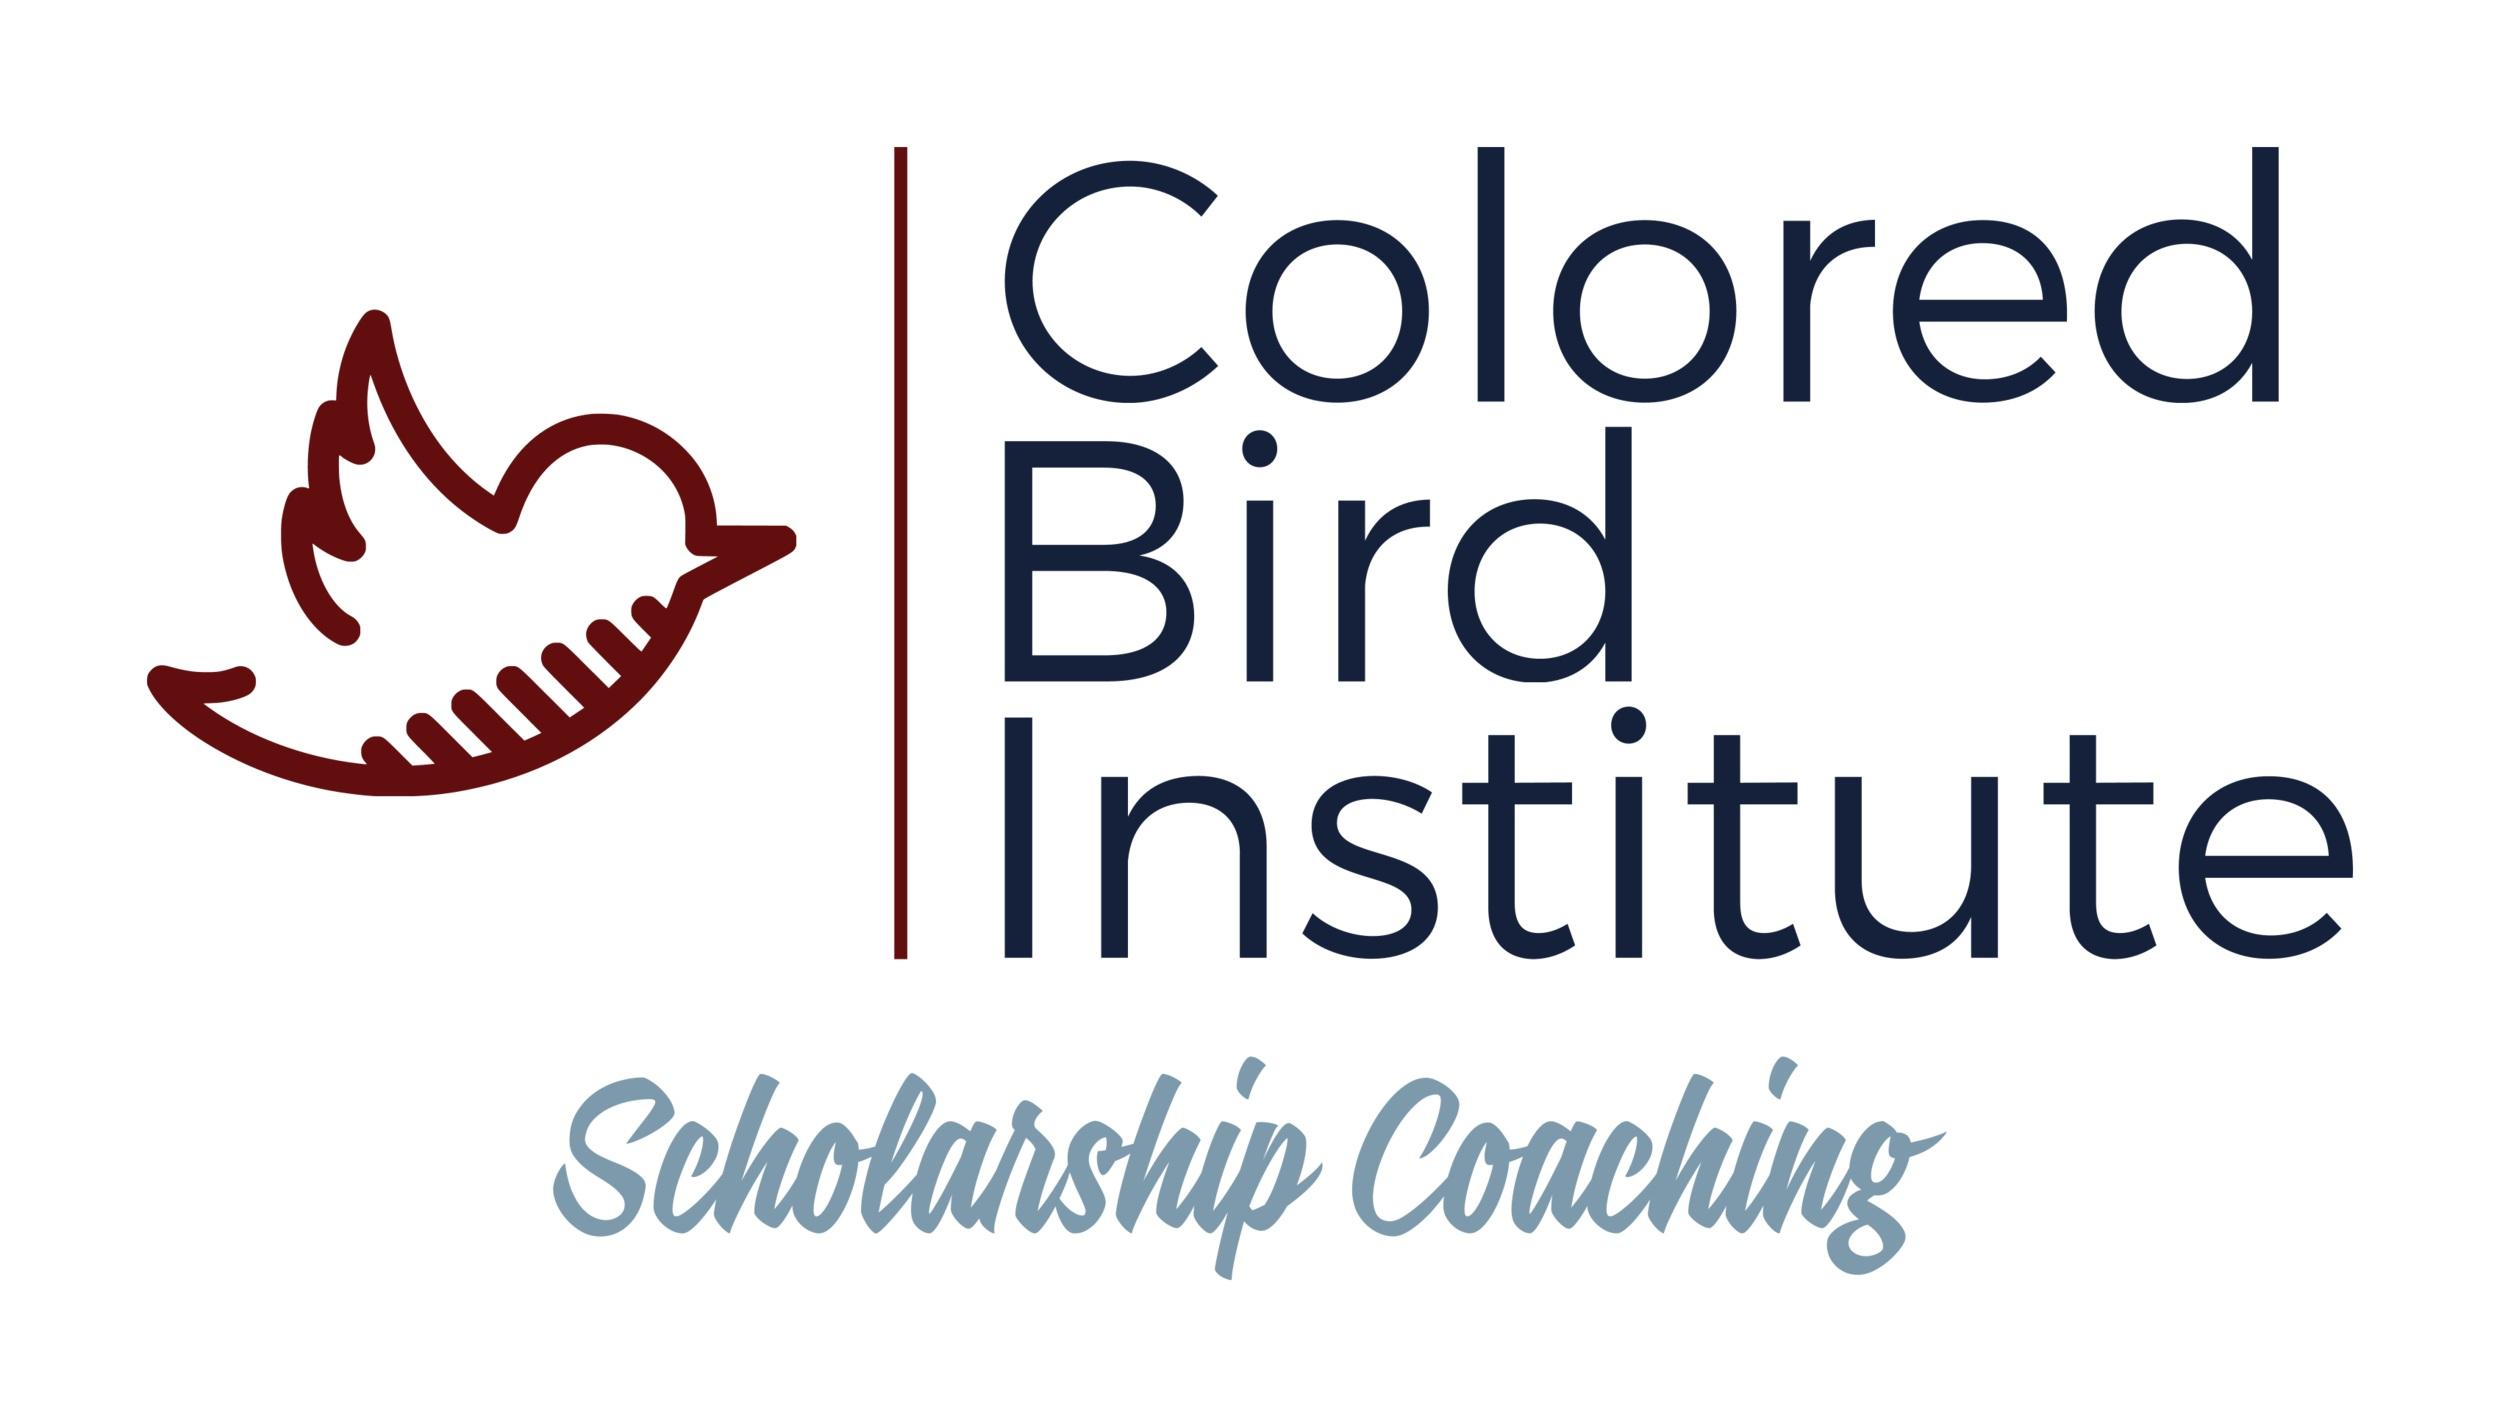 Colored+Bird+Institute.jpg